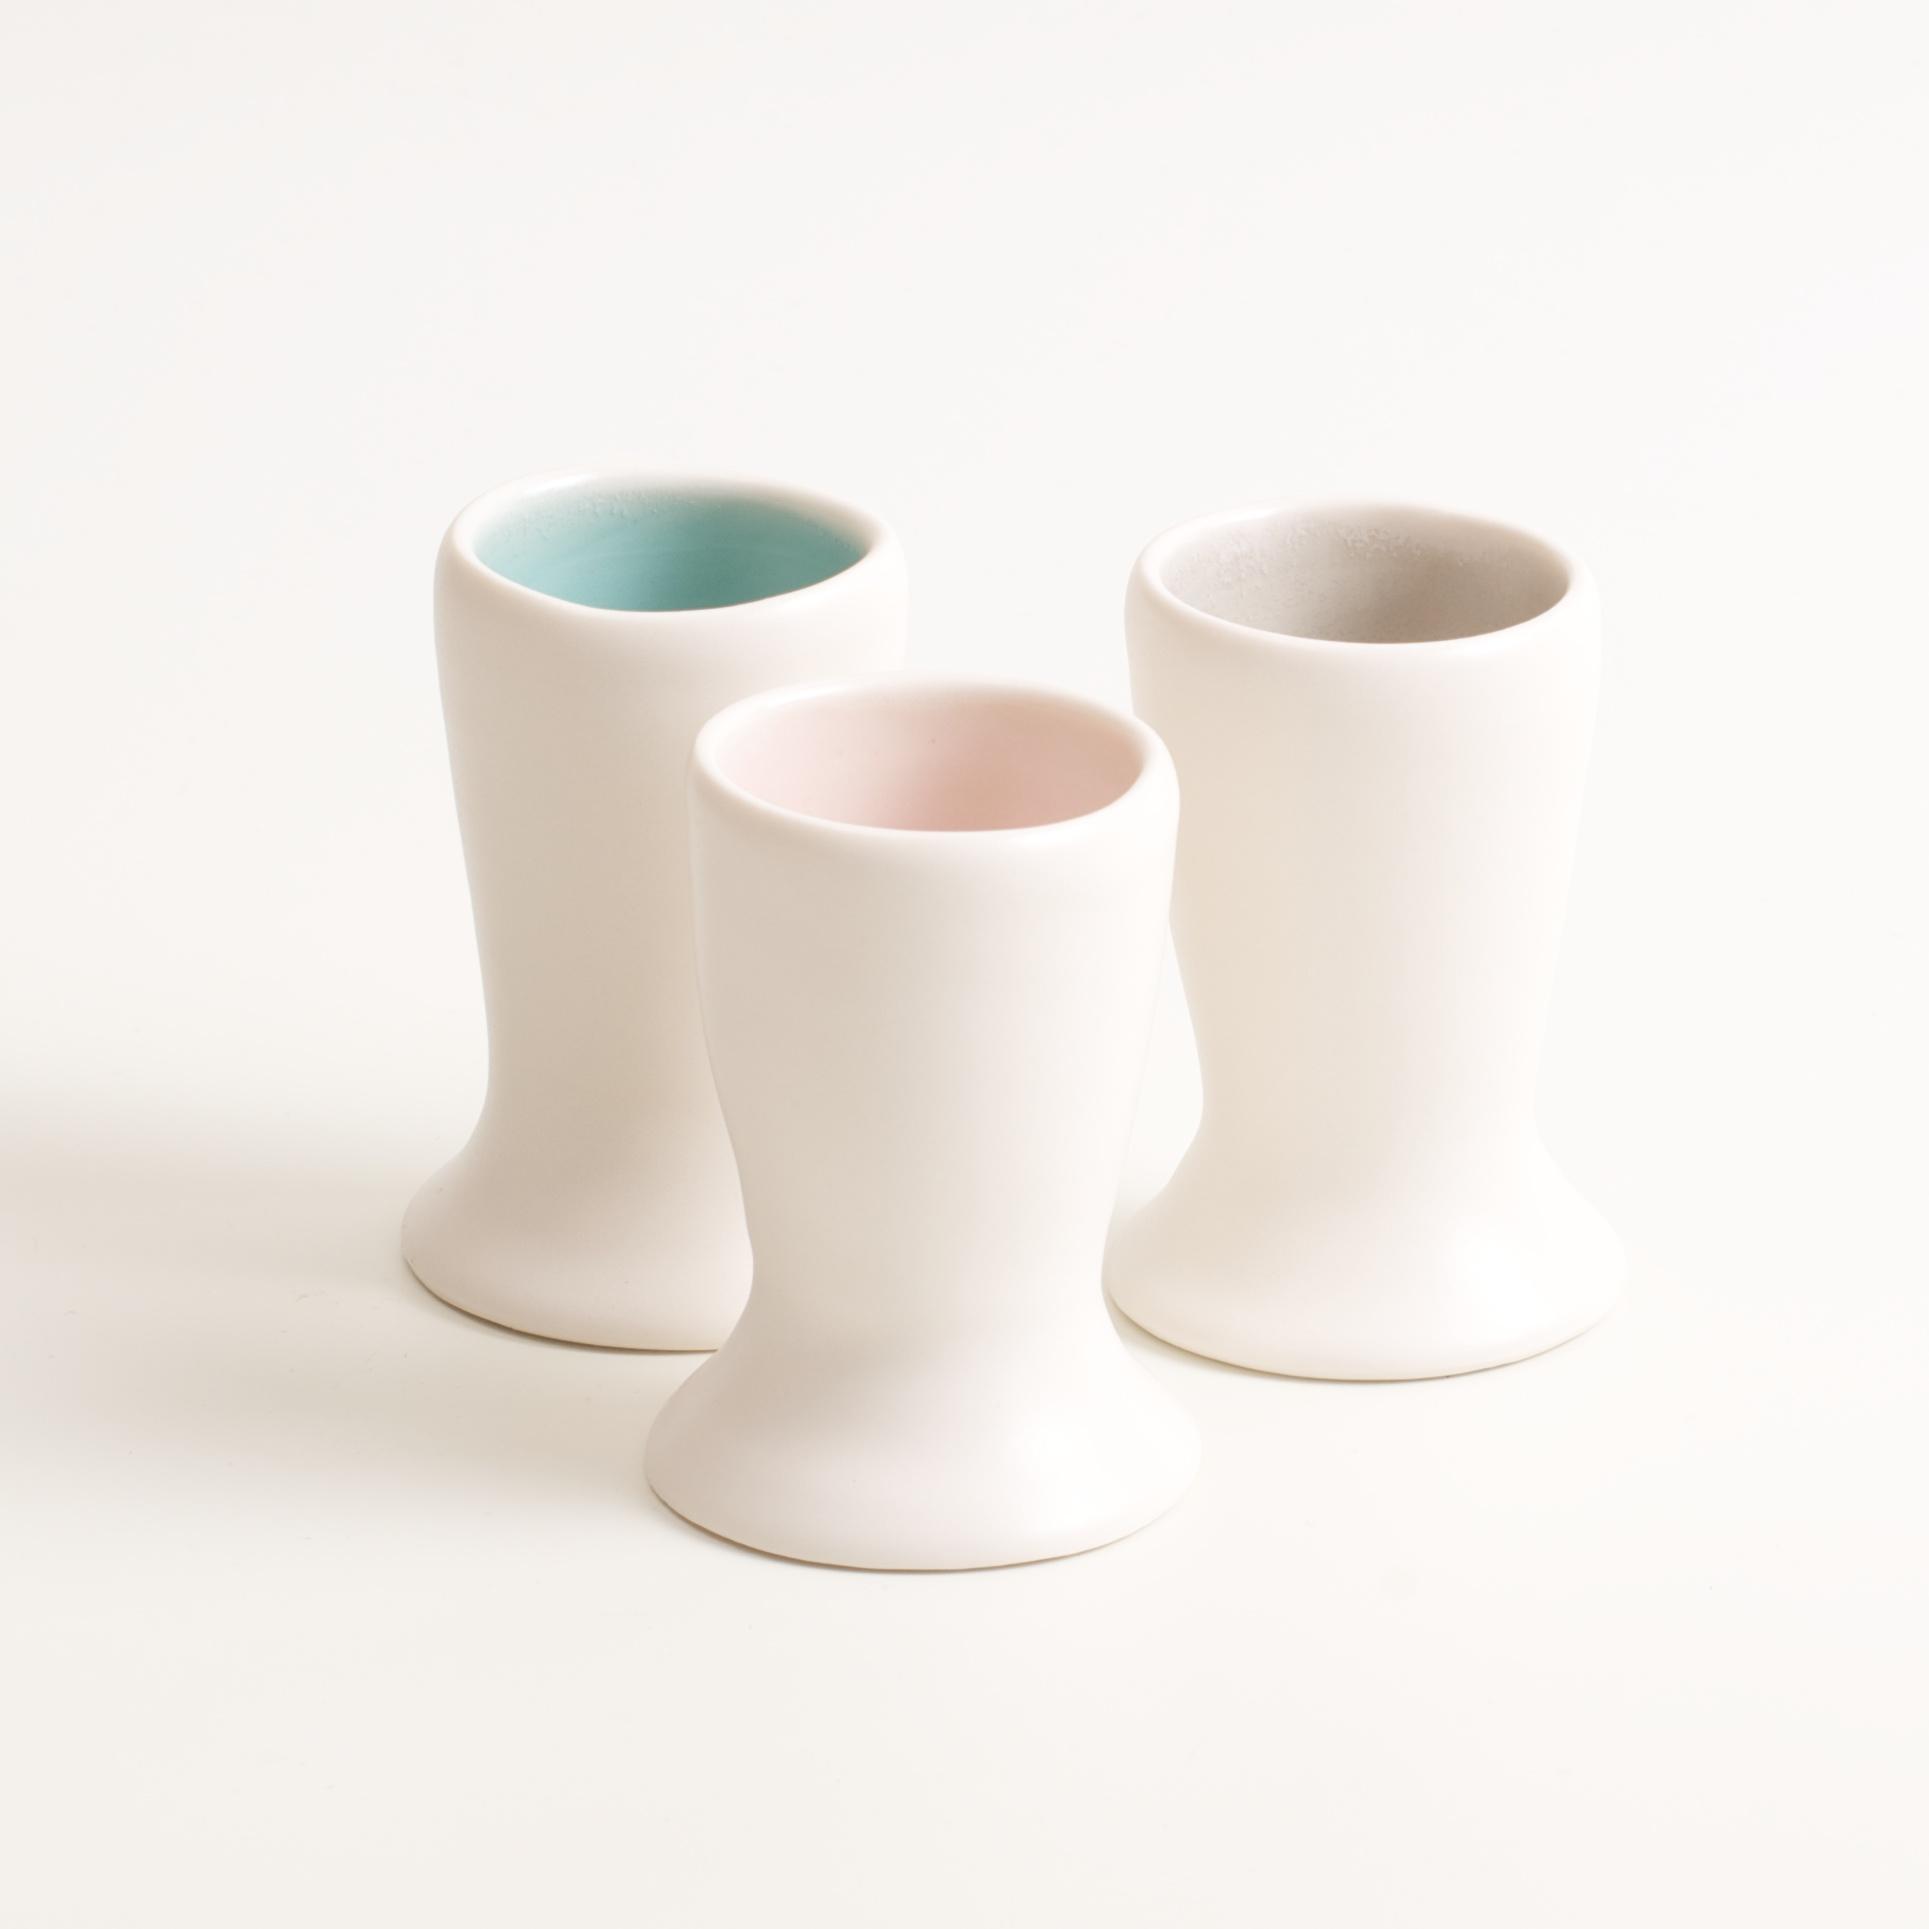 handmade porcelain- tableware- dinnerware- breakfast- eggs- build eggs- egg cup- turquoise - grey- pink